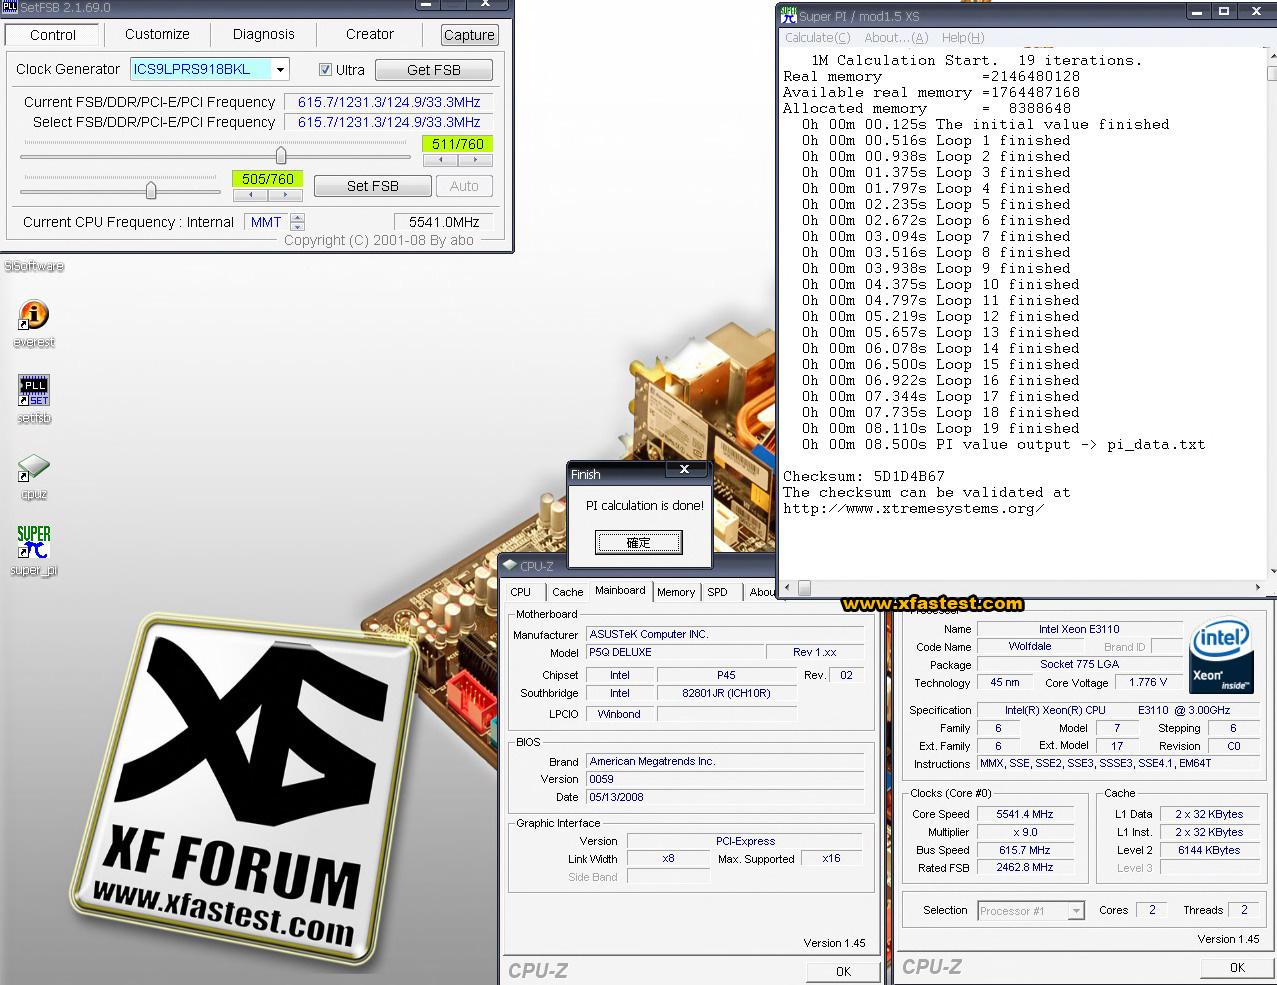 http://pic.xfastest.com/MB/ASUS/P5Q-Deluxe/p5q-d-ln2-03.jpg